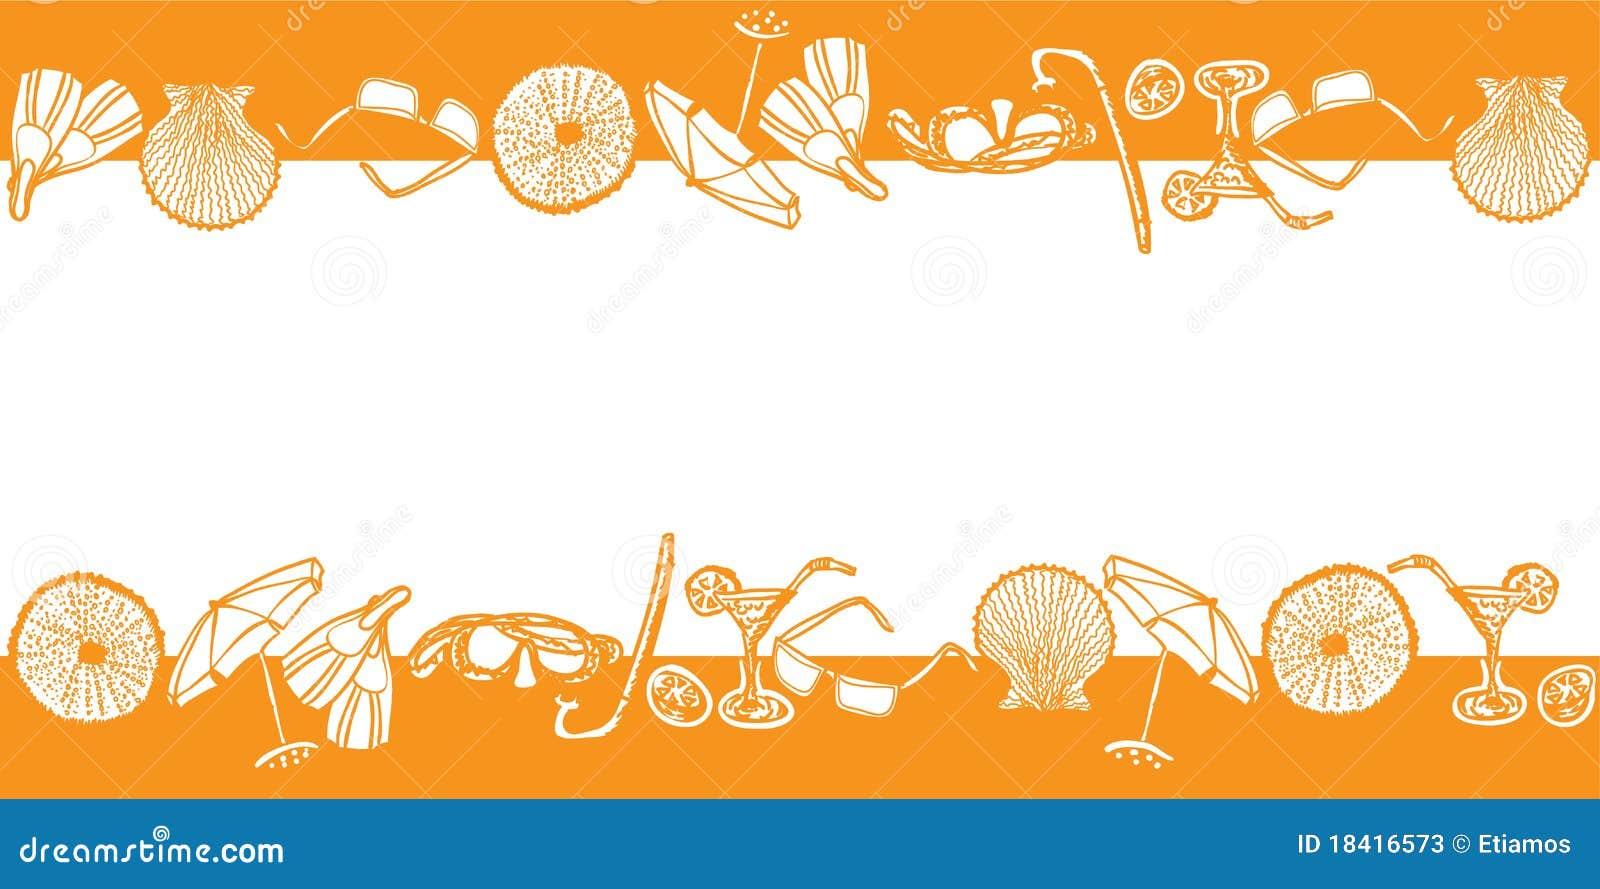 Summer Design Stock Photos - Image: 18416573